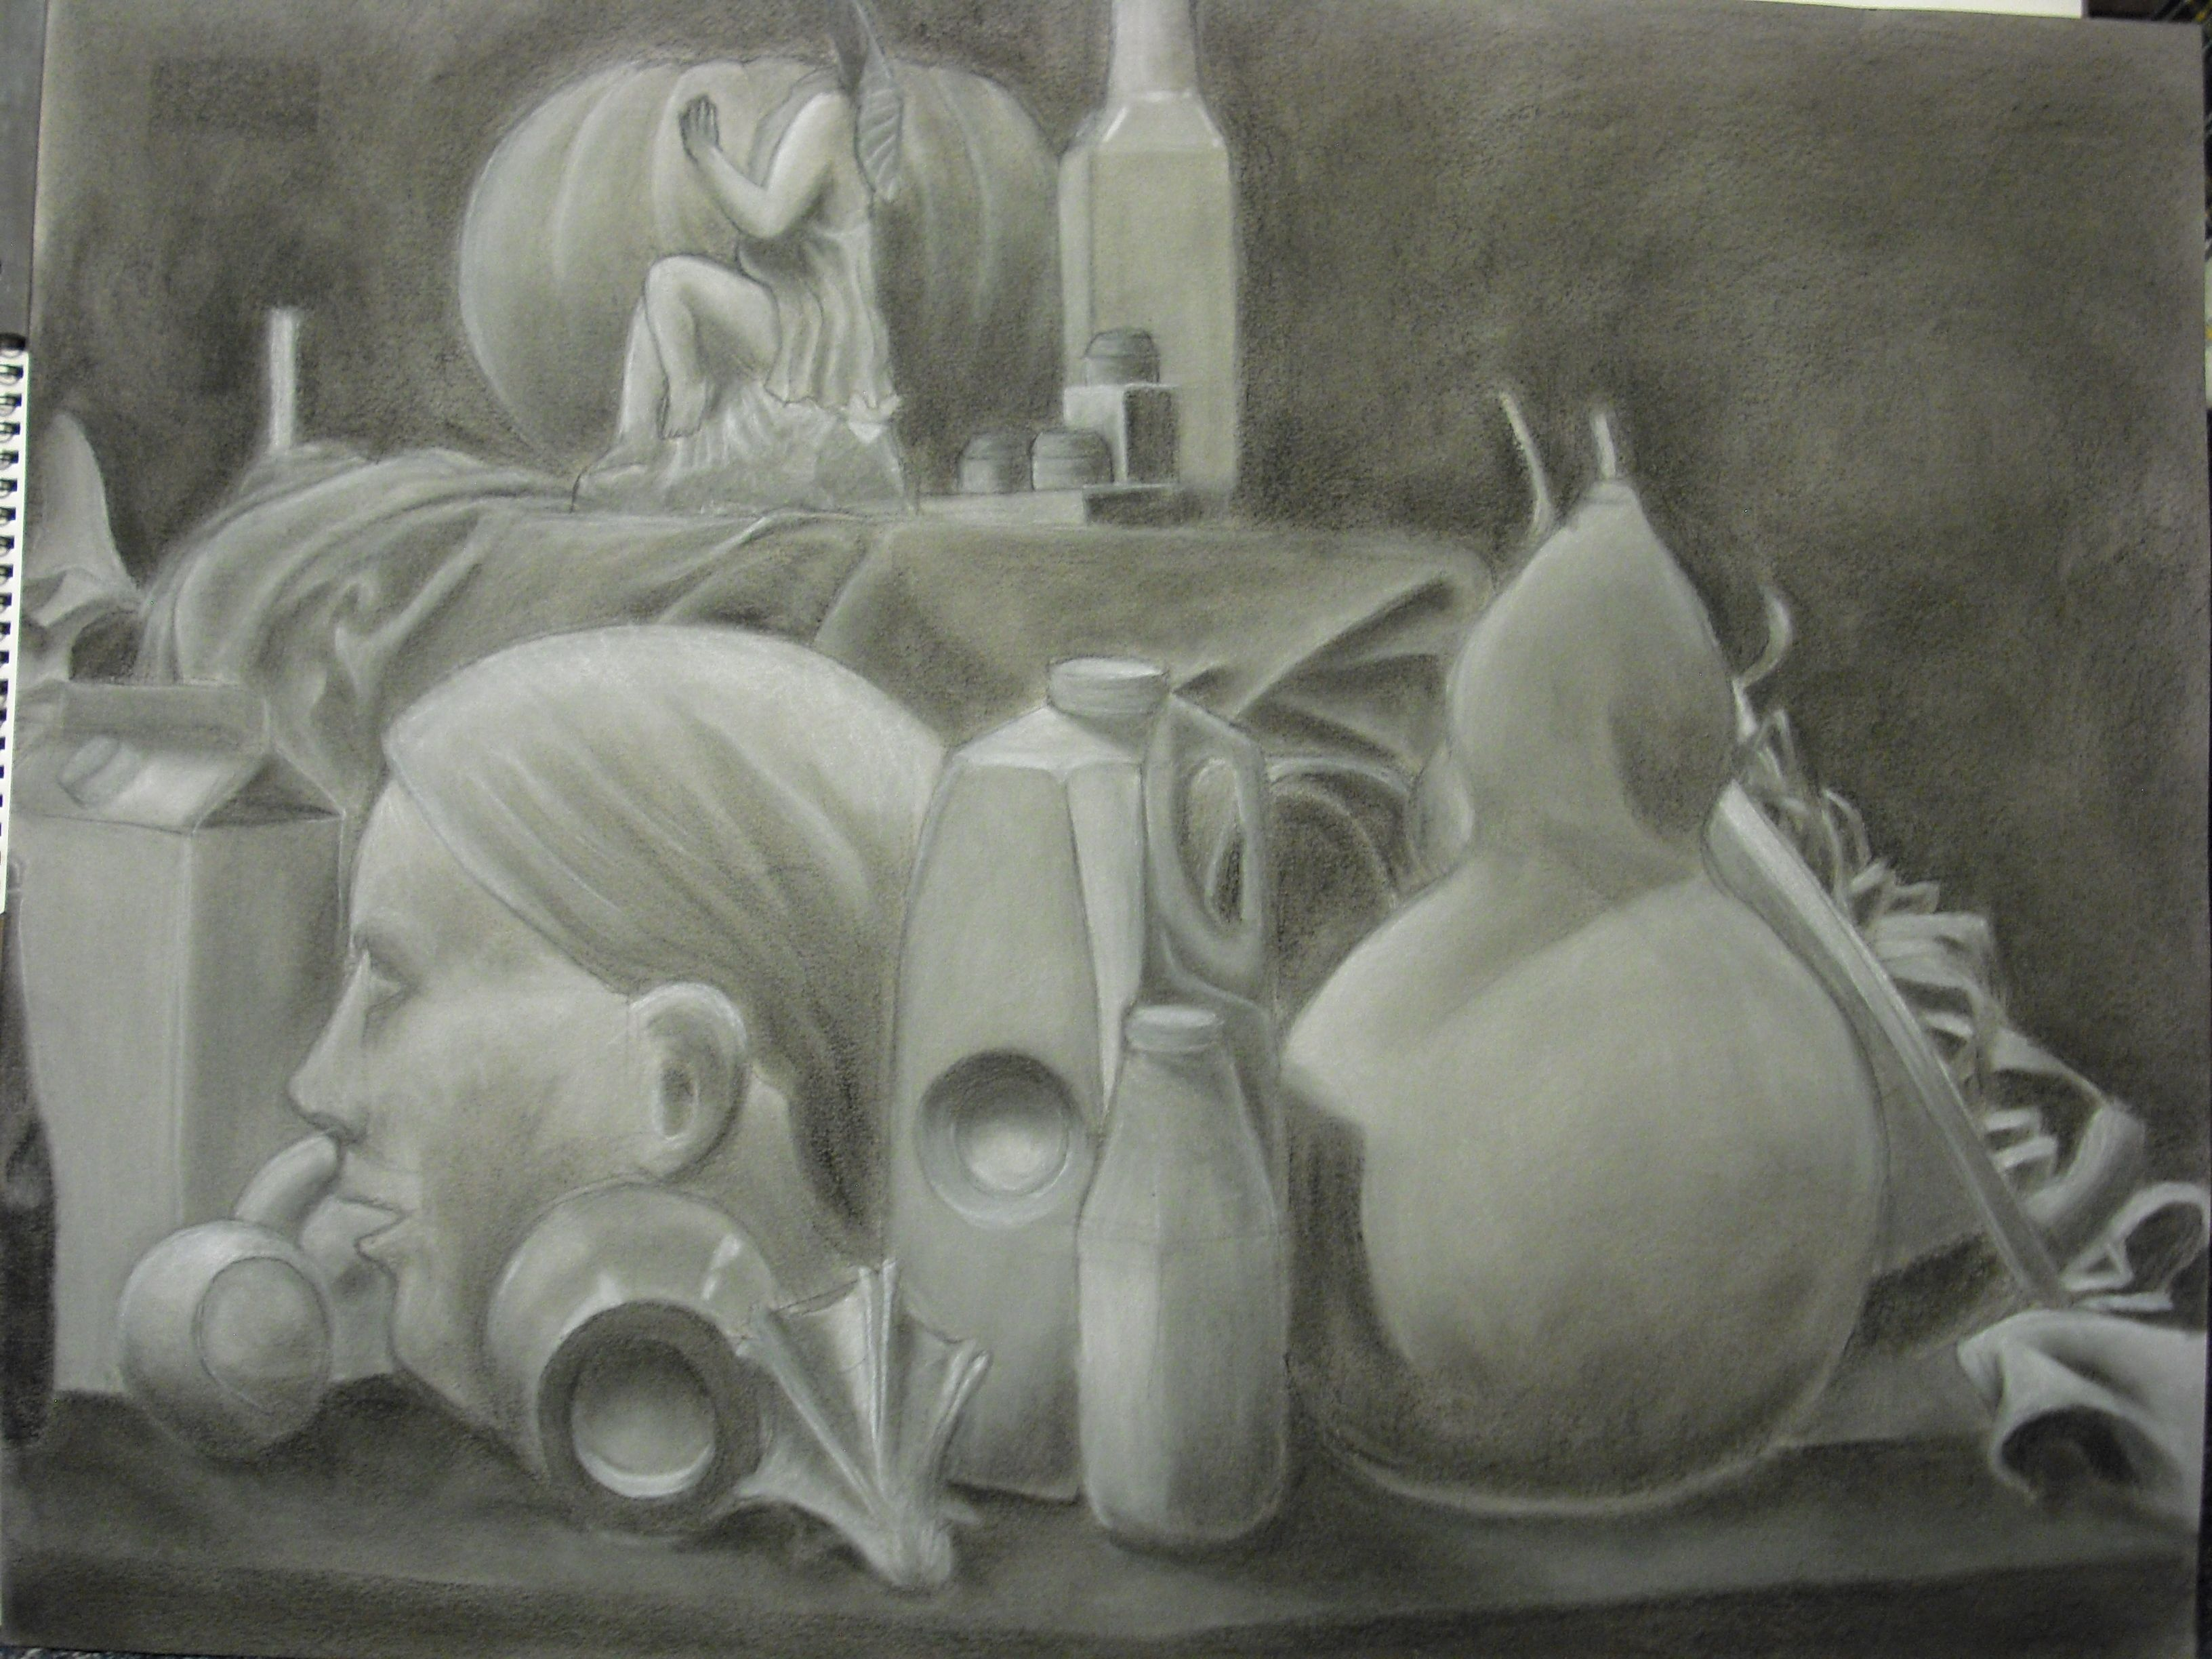 Drawn still life graphite Of drawing reeves Quakenbush we